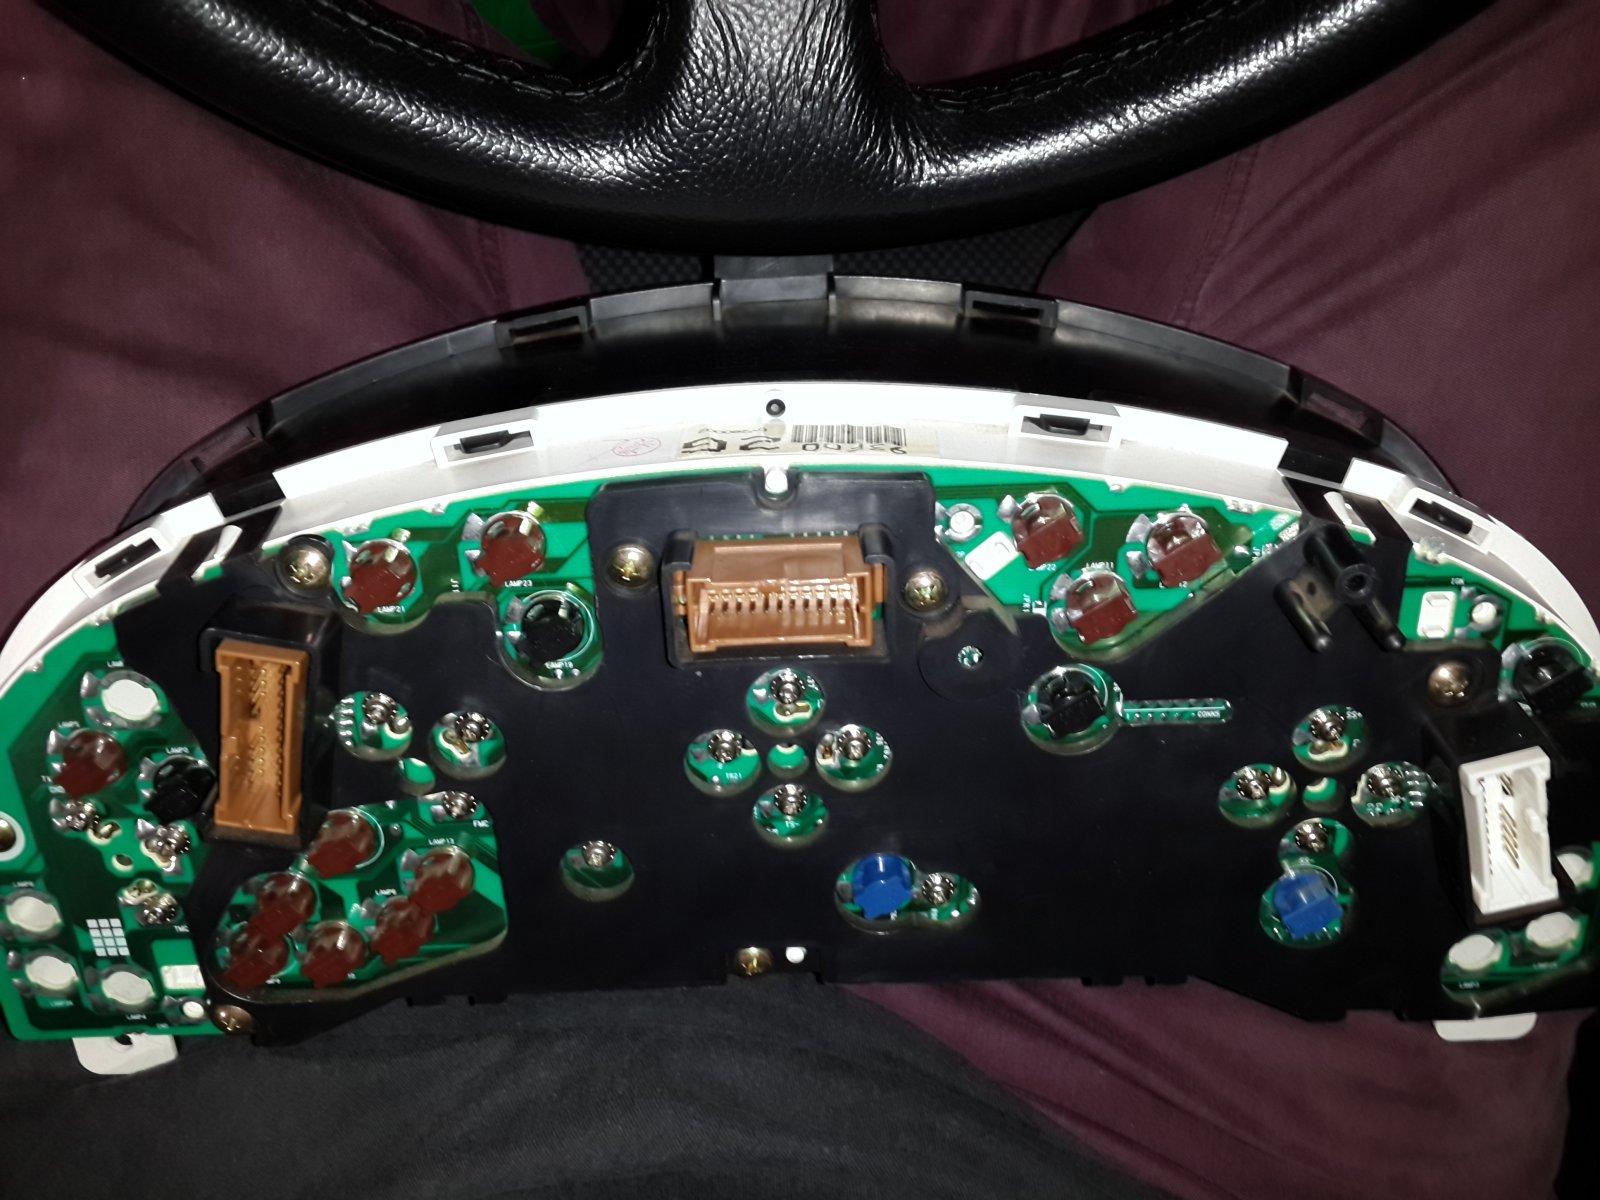 S15 interior